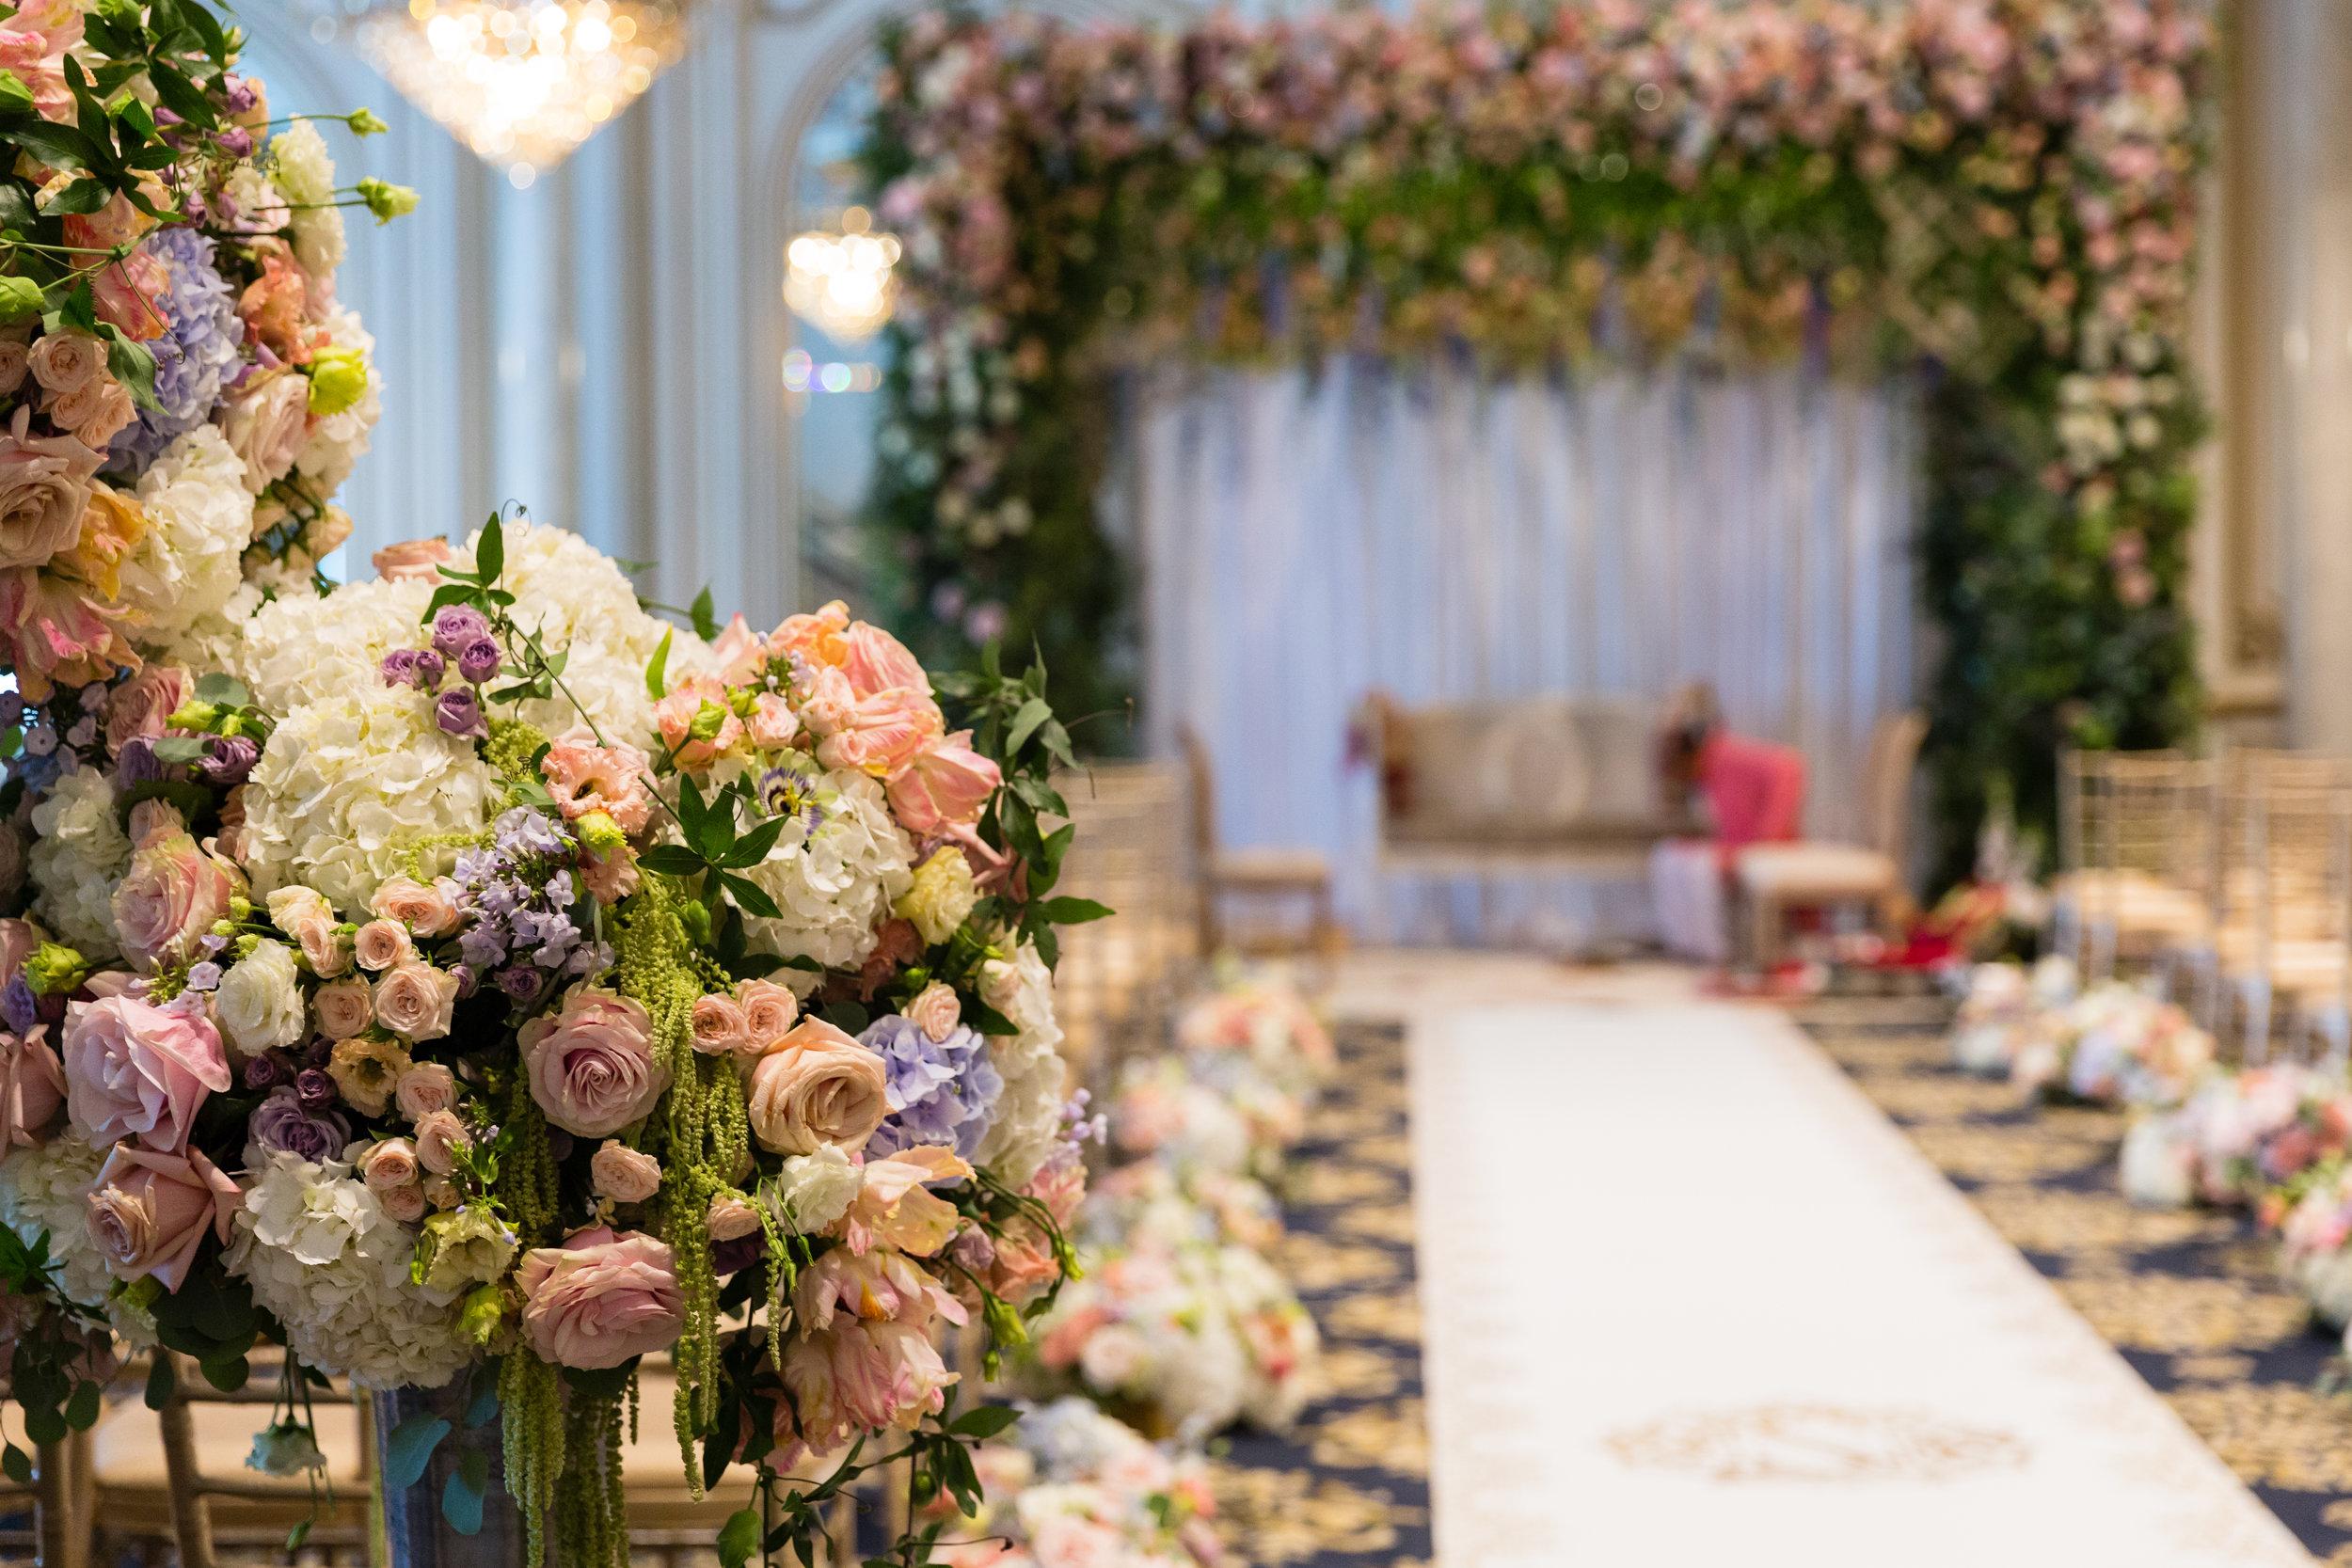 INDIAN WEDDING CEREMONY FLOWER DECOR.jpg